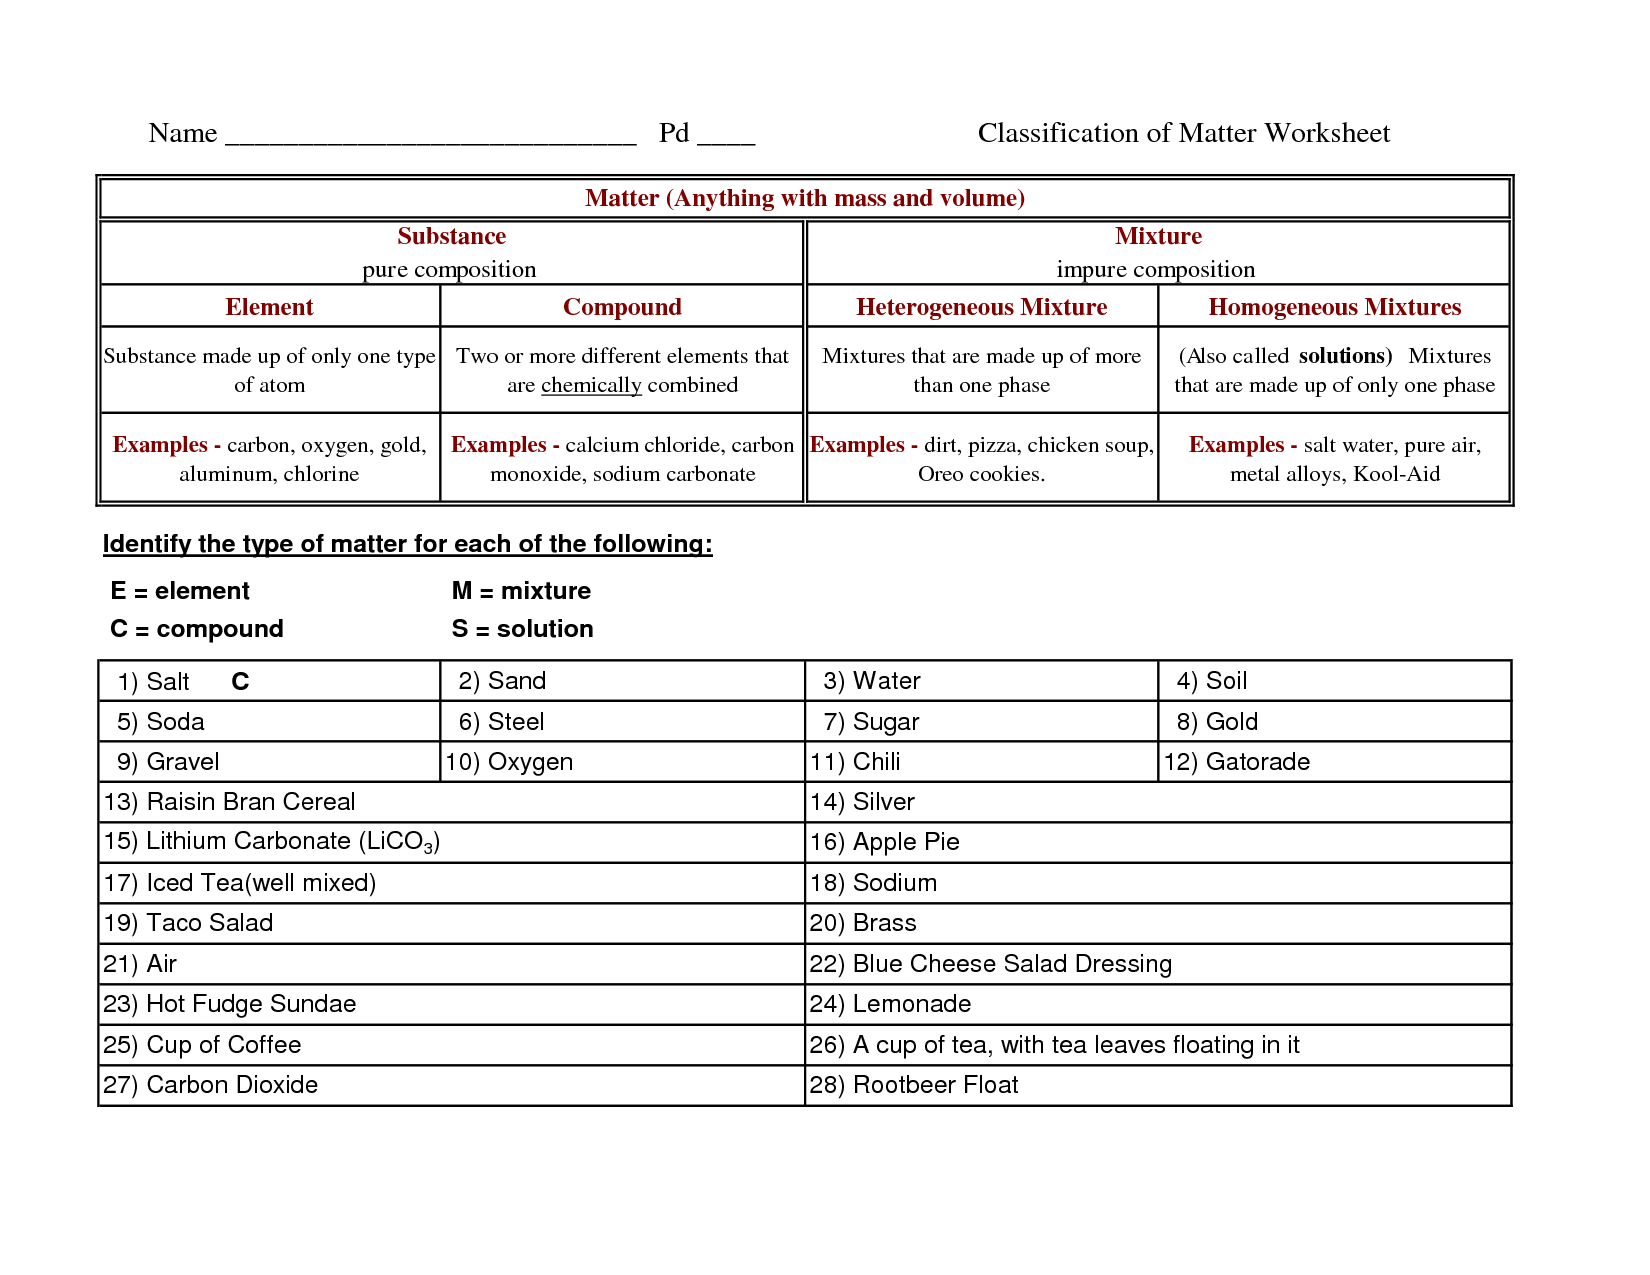 Heterogeneous Vs Homogeneous Worksheet   Printable Worksheets and  Activities for Teachers [ 1275 x 1650 Pixel ]